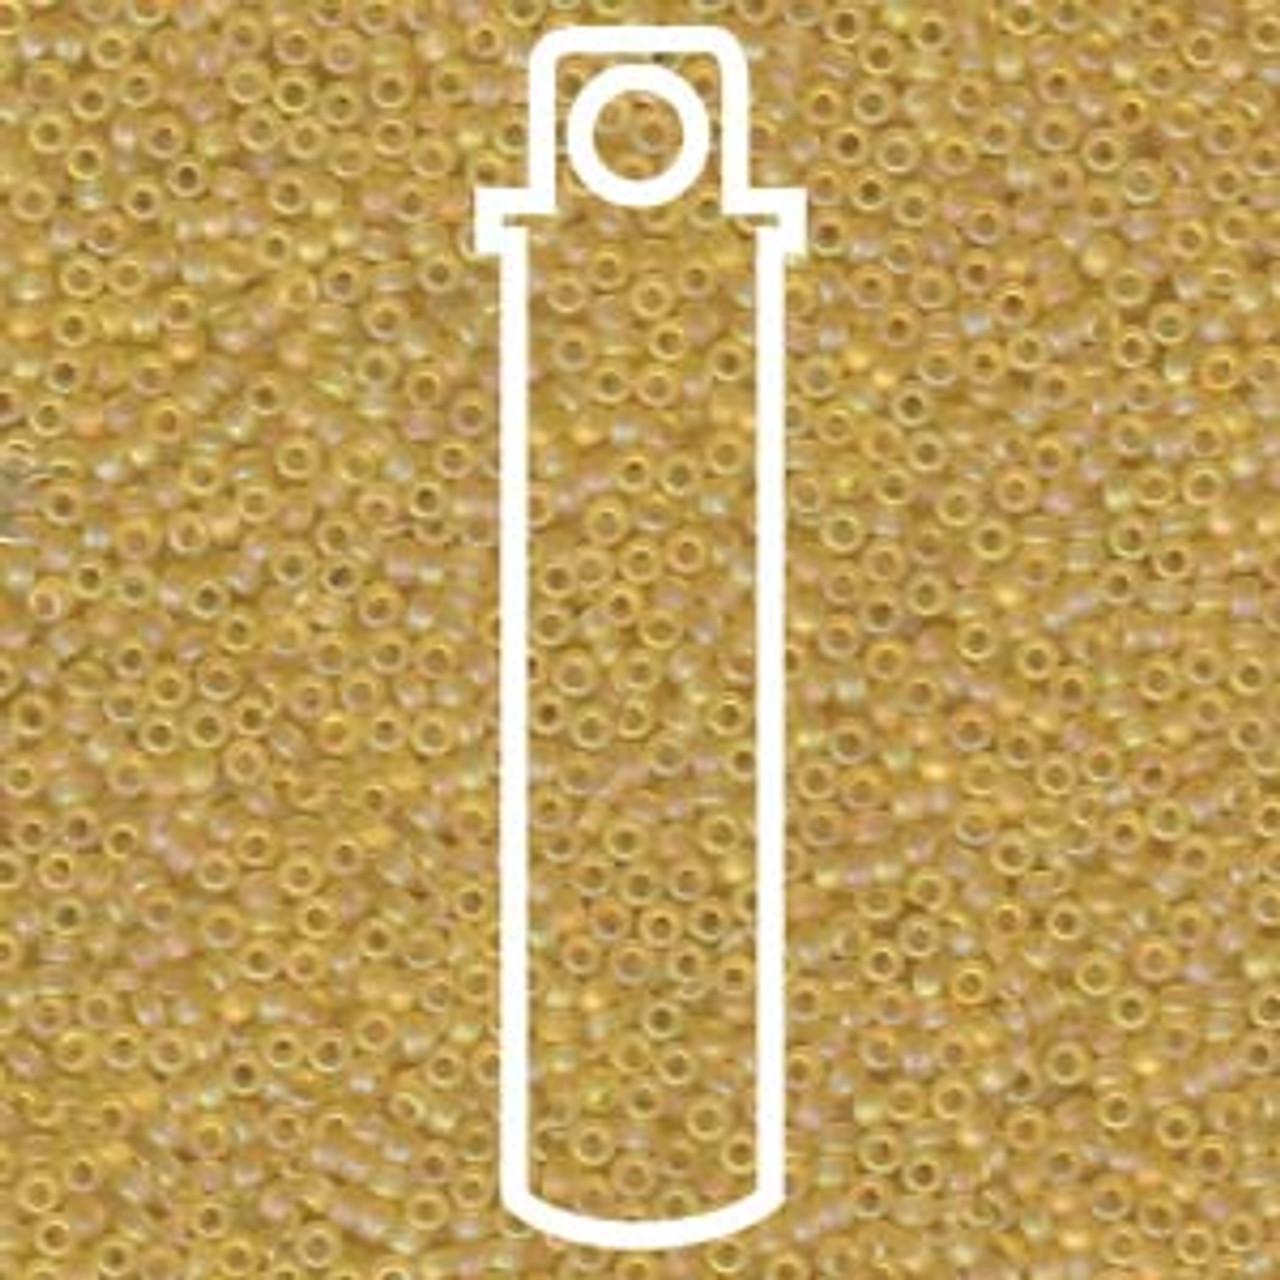 15/0 Matte Cantaloupe AB Miyuki Seed Beads (8 Grams) 15-9132fr